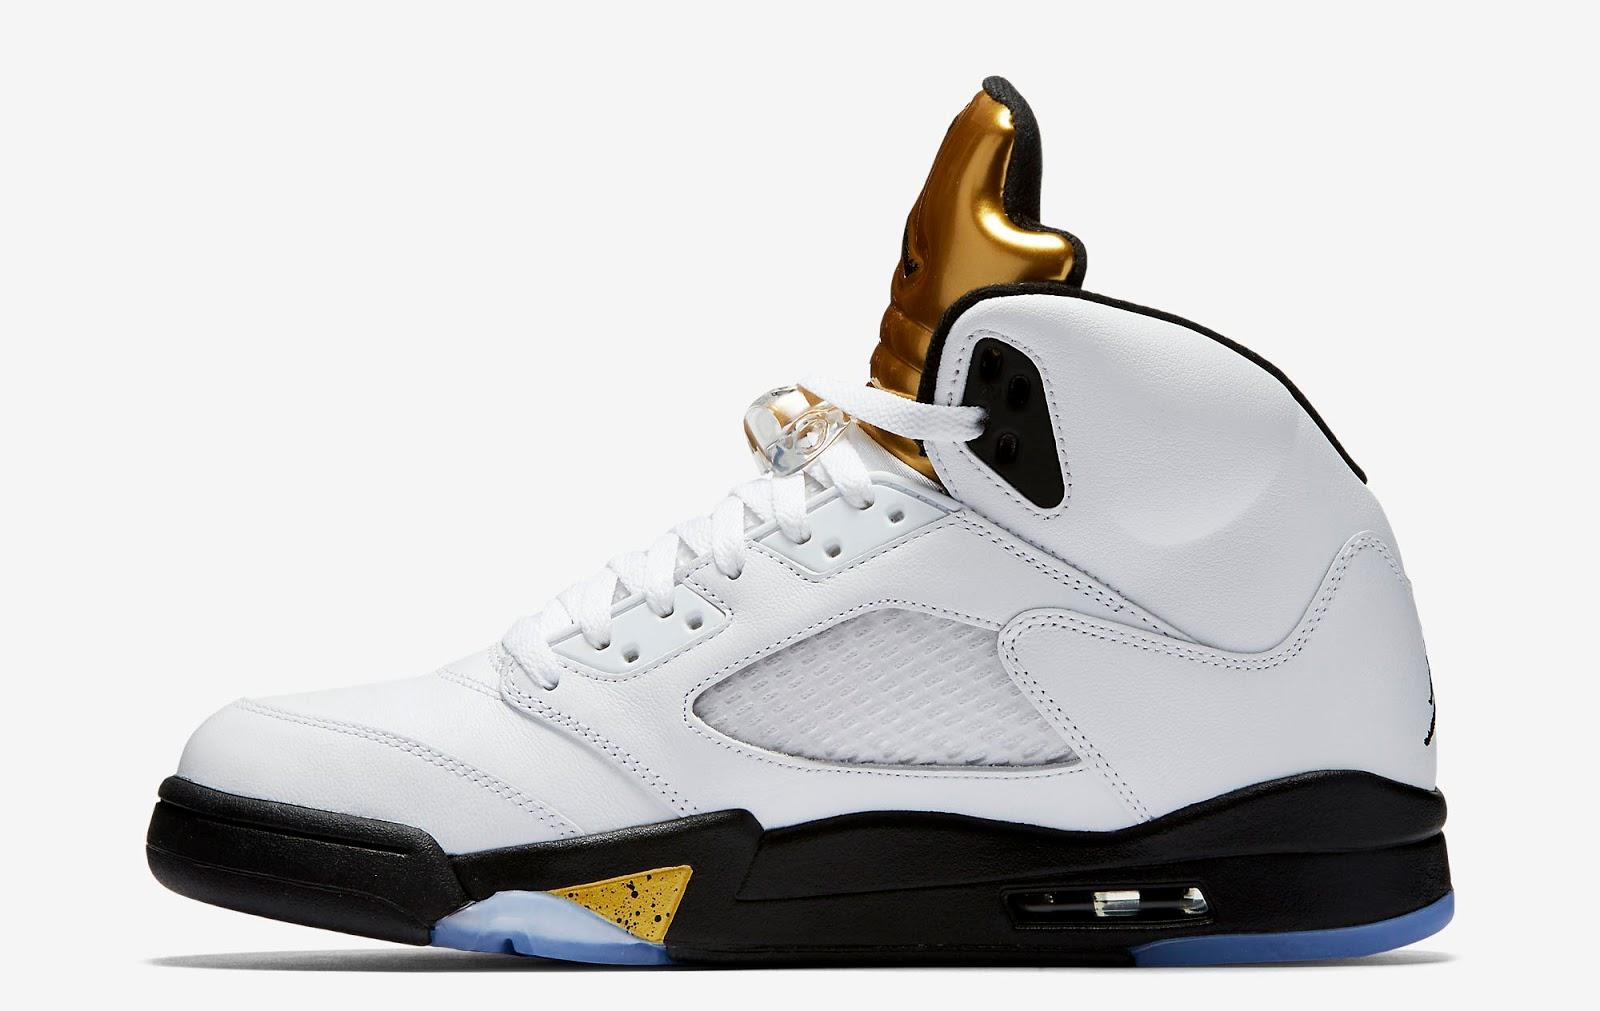 232fffeedb0996 ajordanxi Your  1 Source For Sneaker Release Dates  Air Jordan 5 Retro